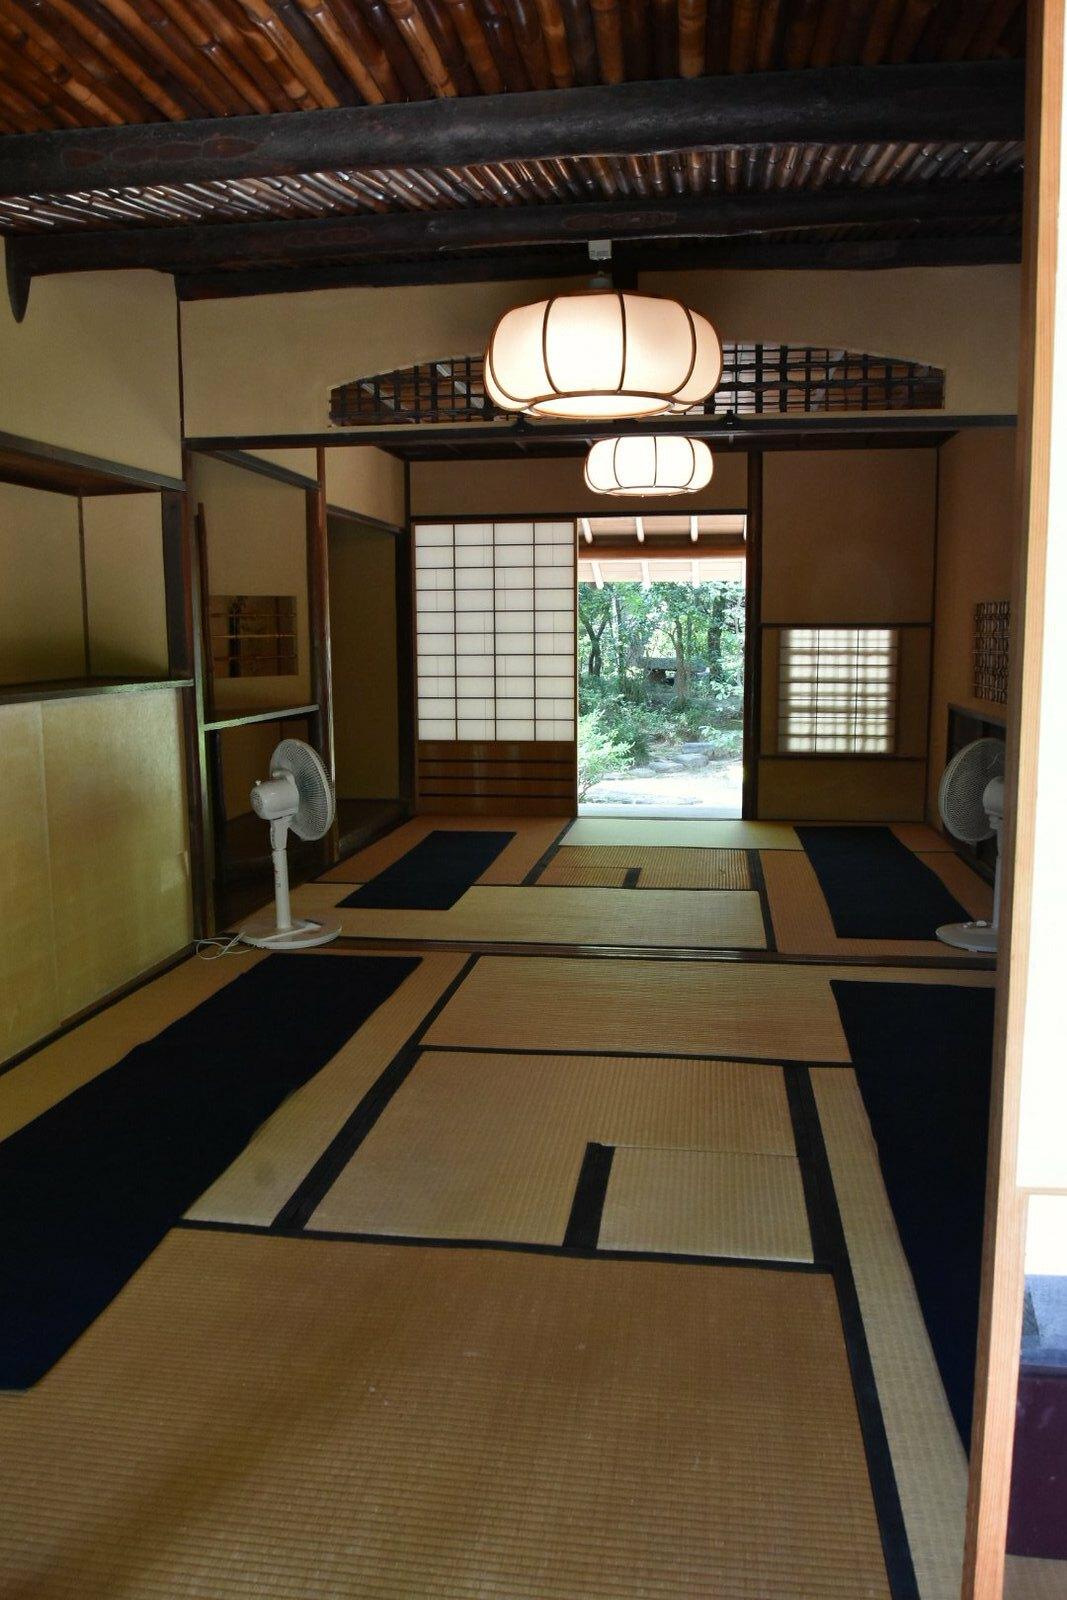 Takamatsu, Ritsurin-kôen - intérieur du salon de thé